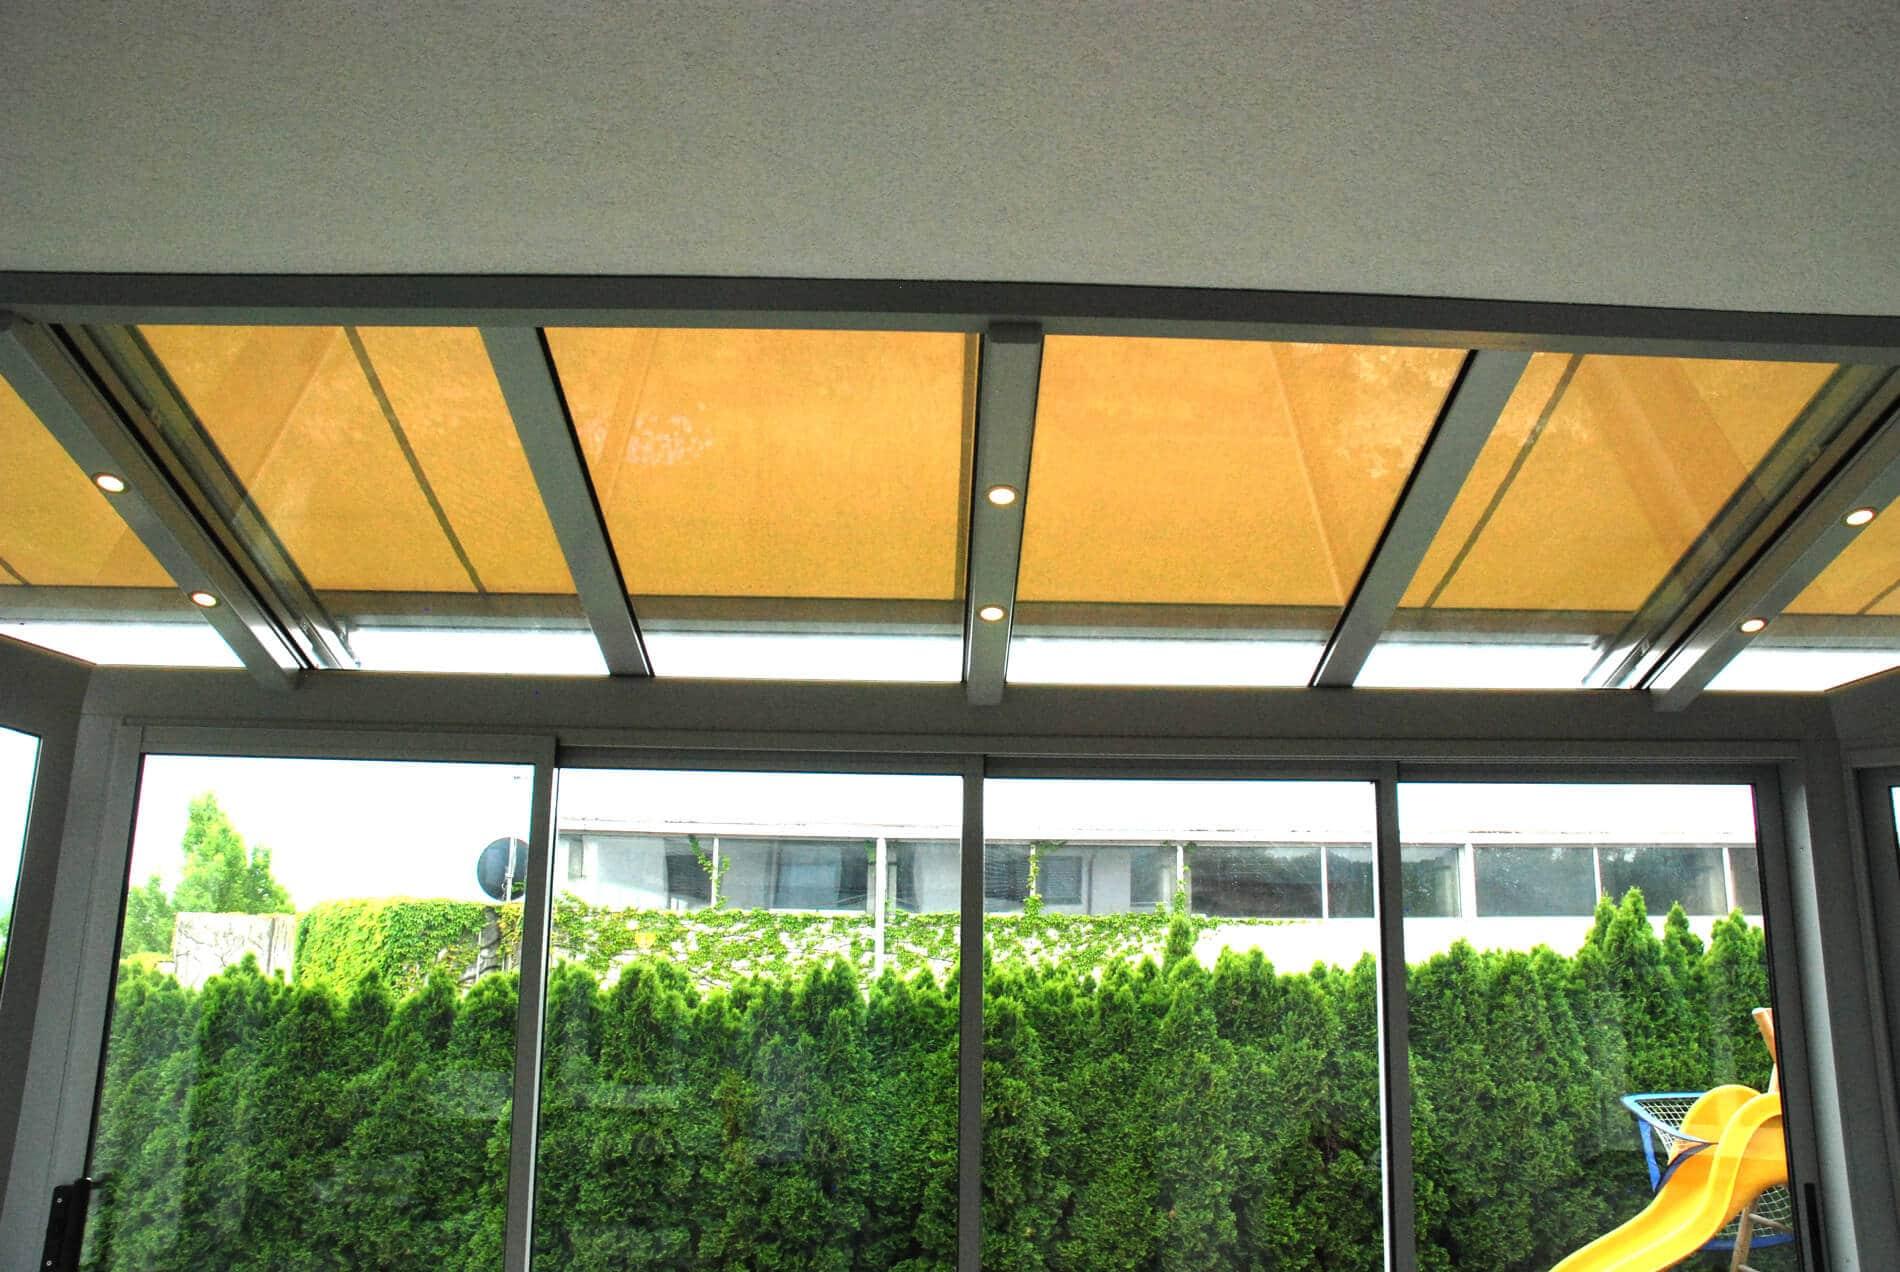 Sommergarten mit integrierter LED-Beleuchtung